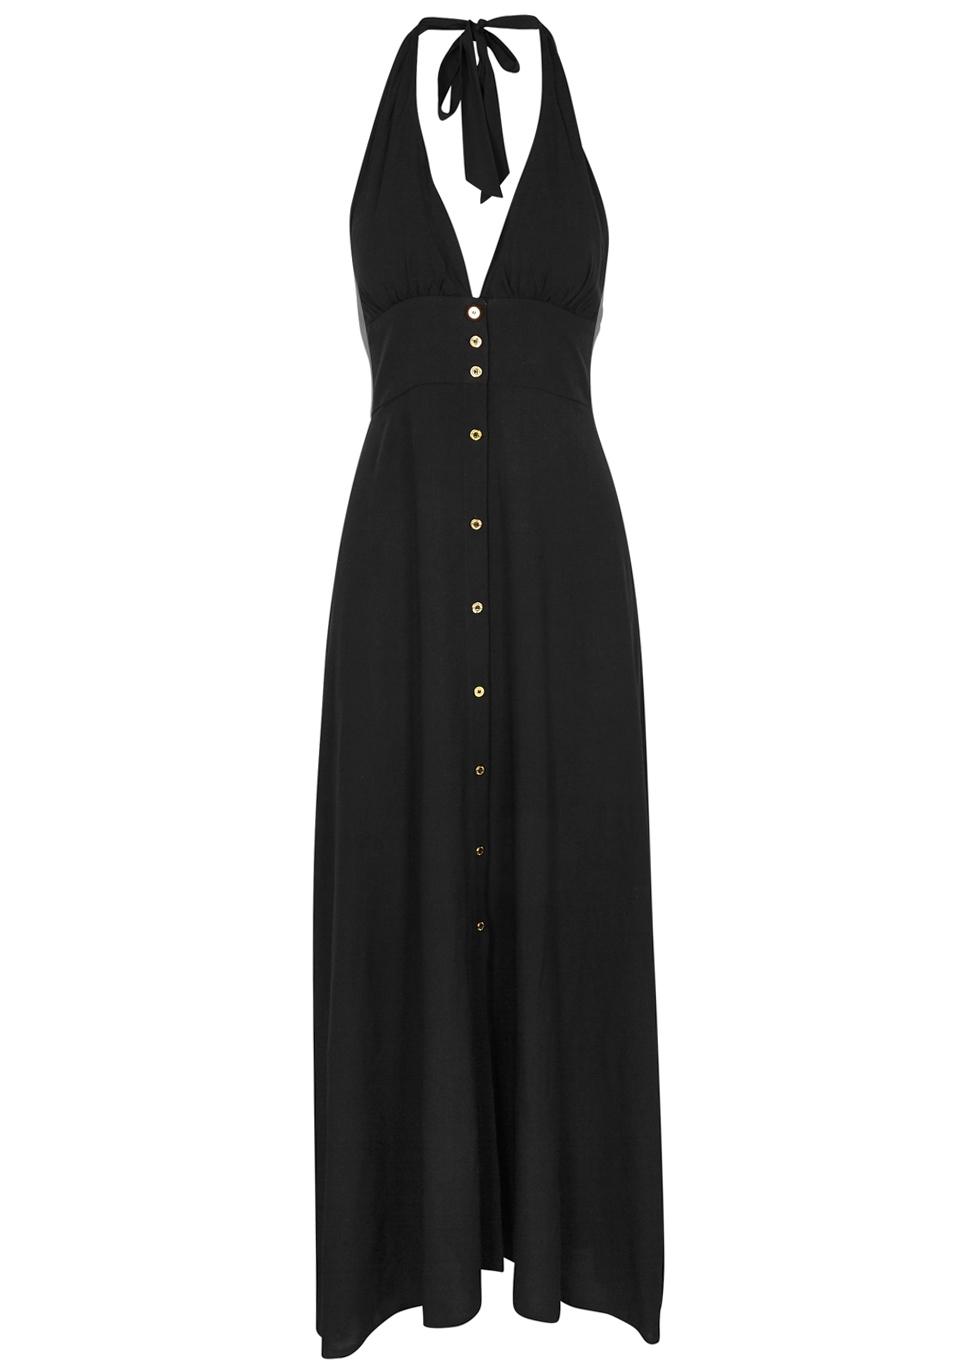 HEIDI KLEIN OMAN BLACK HALTERNECK MAXI DRESS